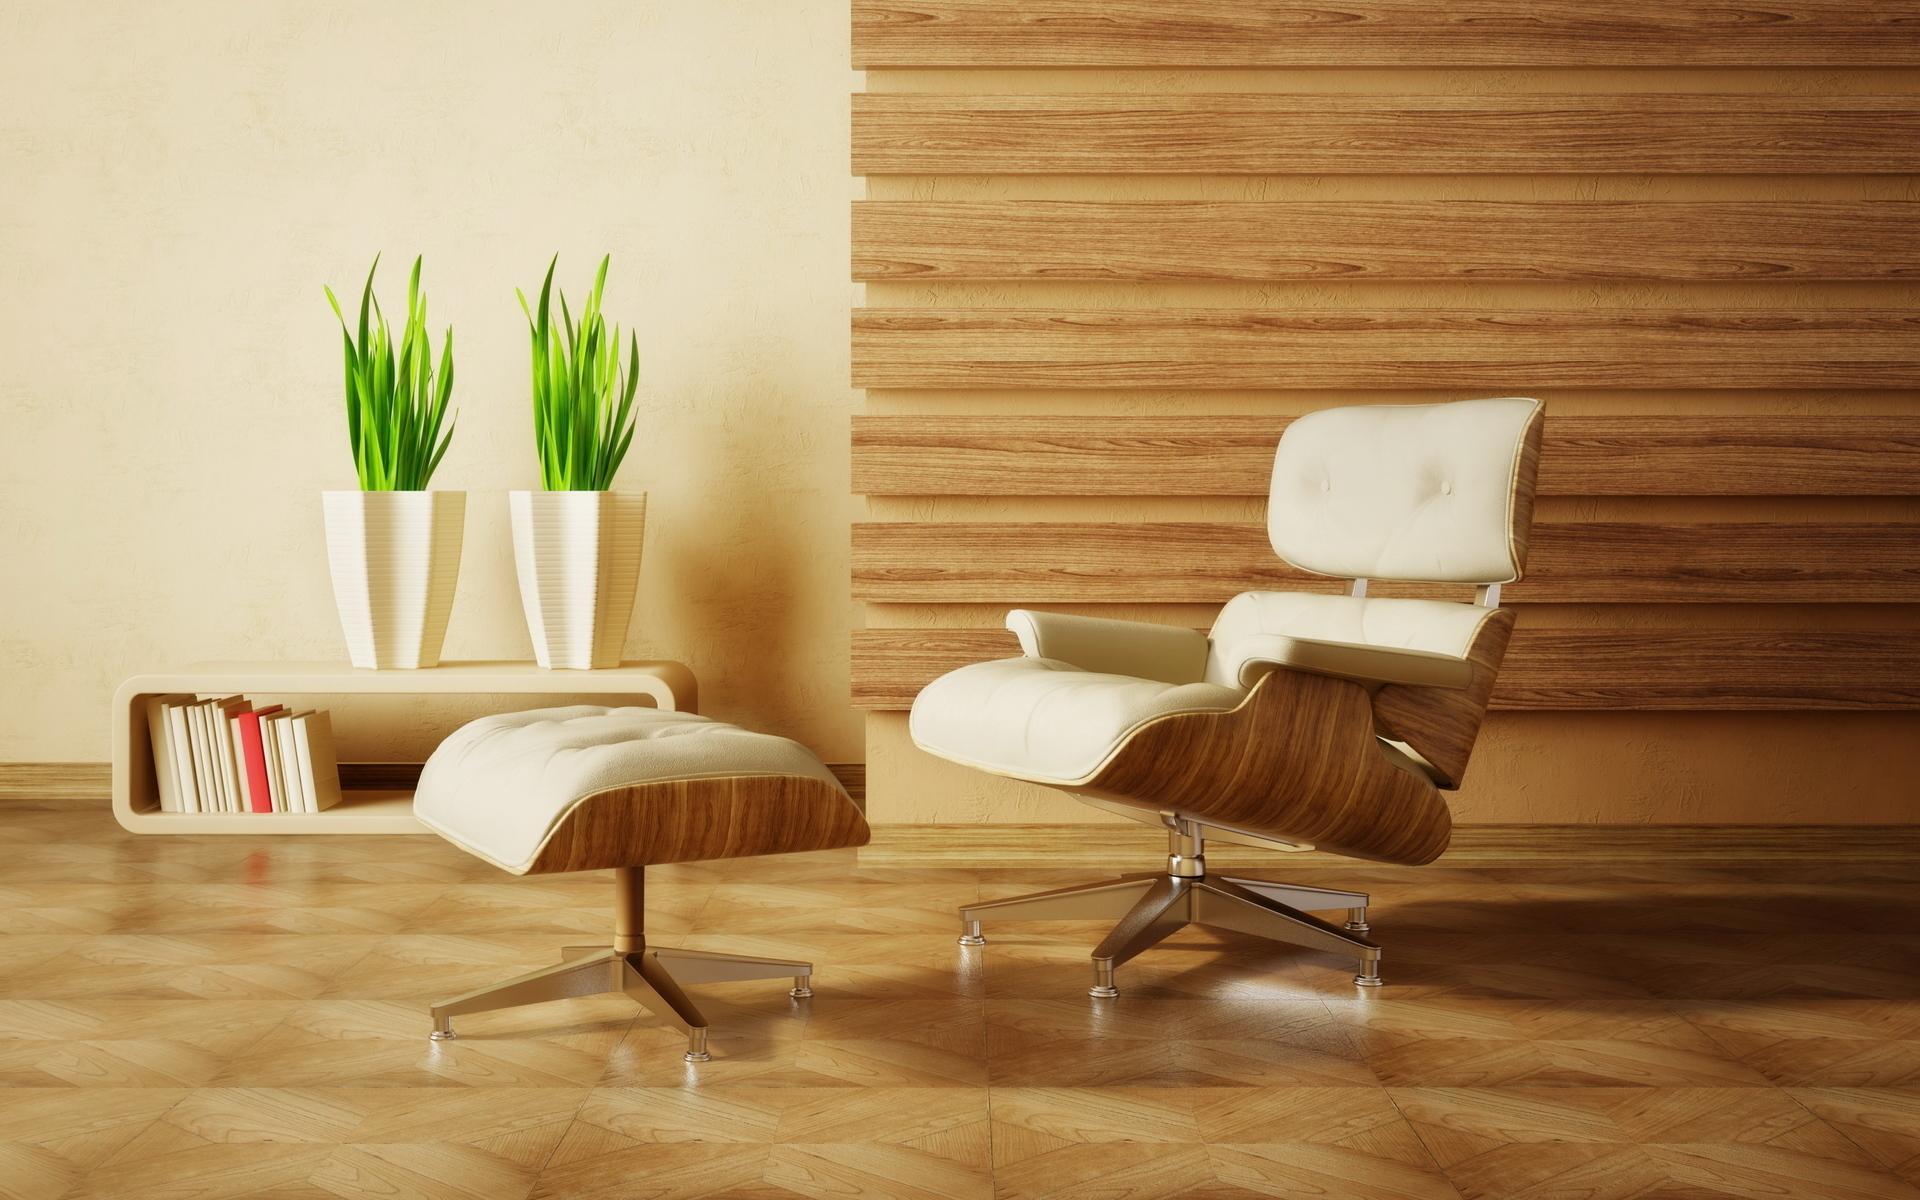 interior-wallpapers-28651-560045.jpg